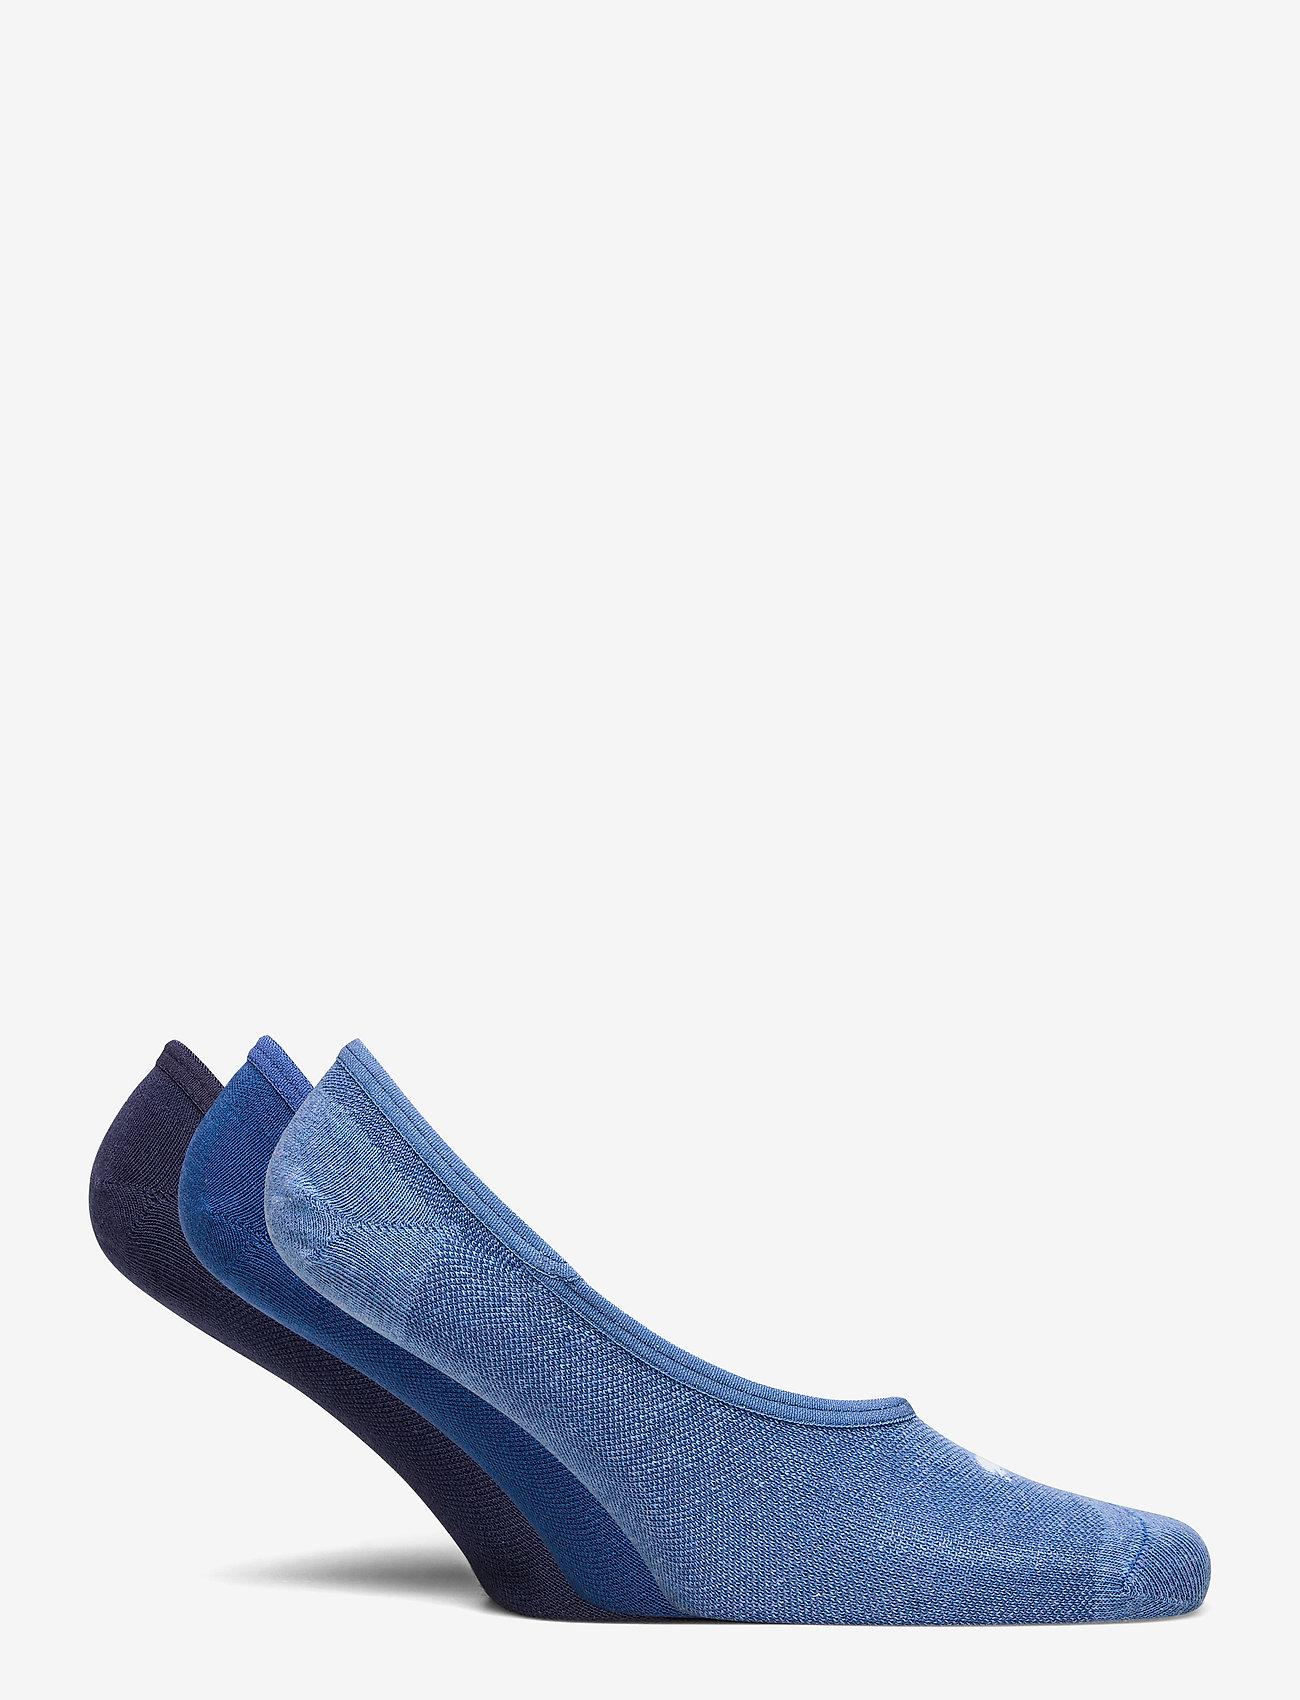 PUMA - PUMA FOOTIE 3P UNISEX - kousen - blue combo - 1